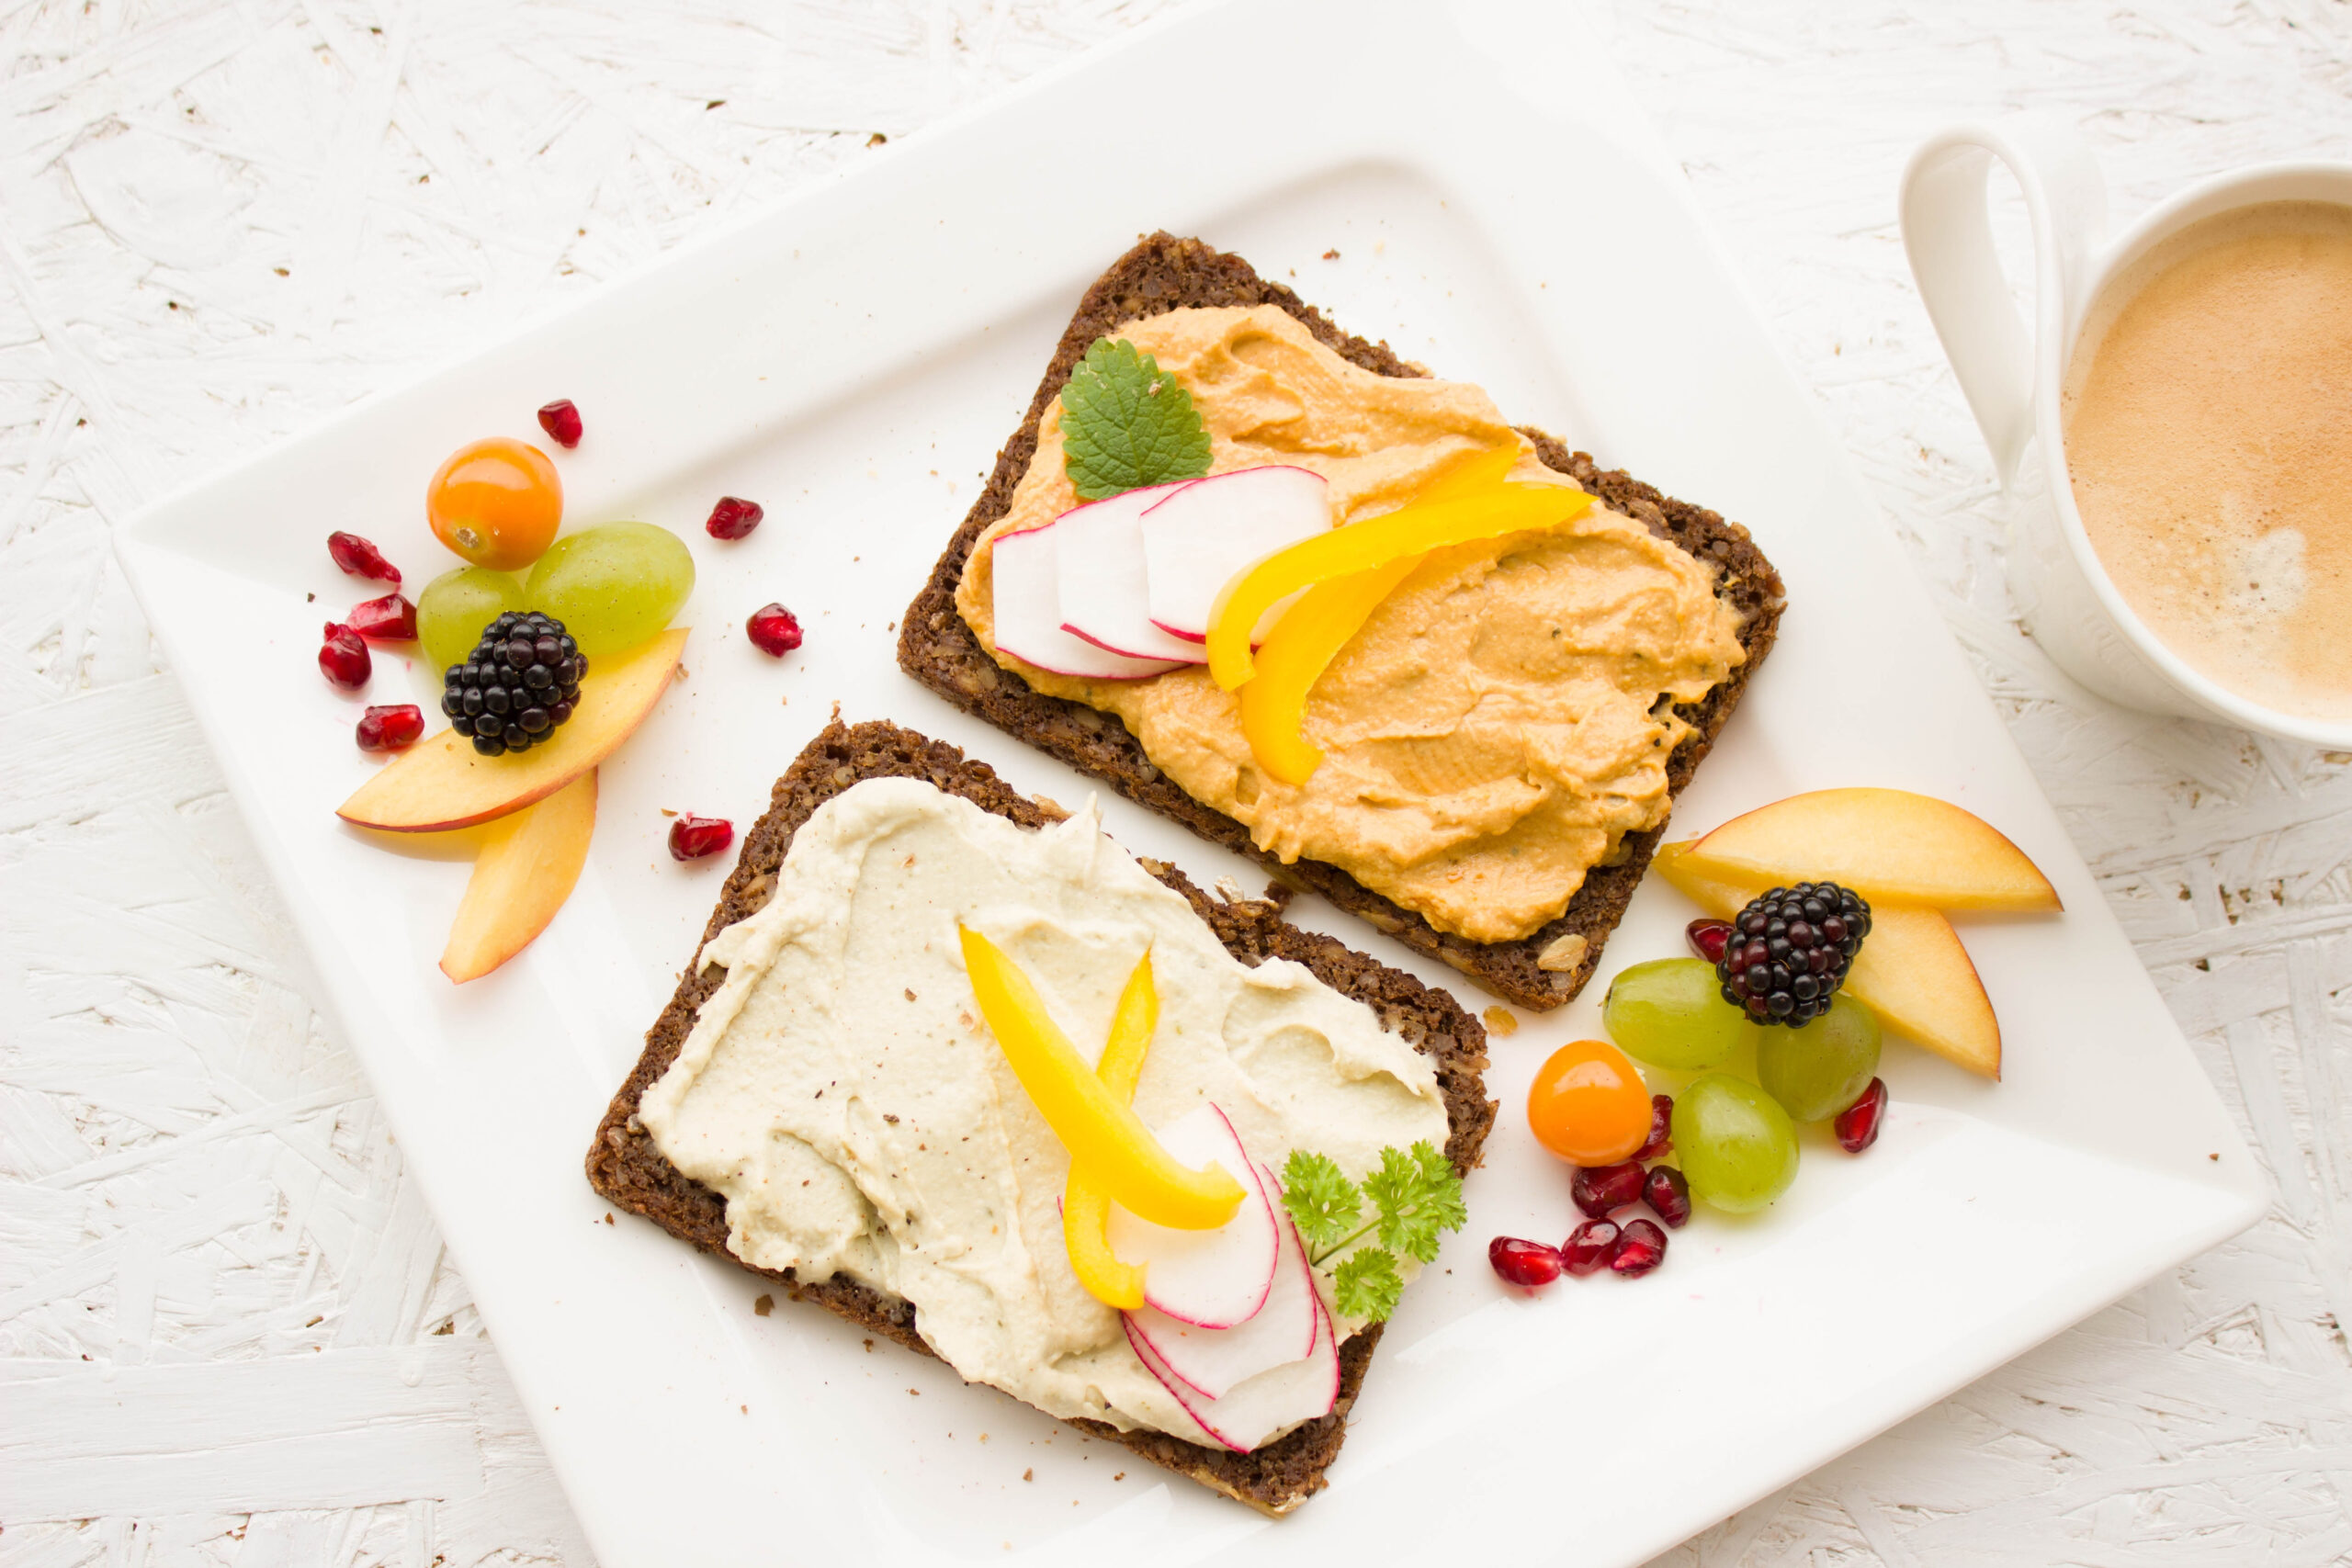 Nourish Your Skin with a Healthy Vegan Breakfast